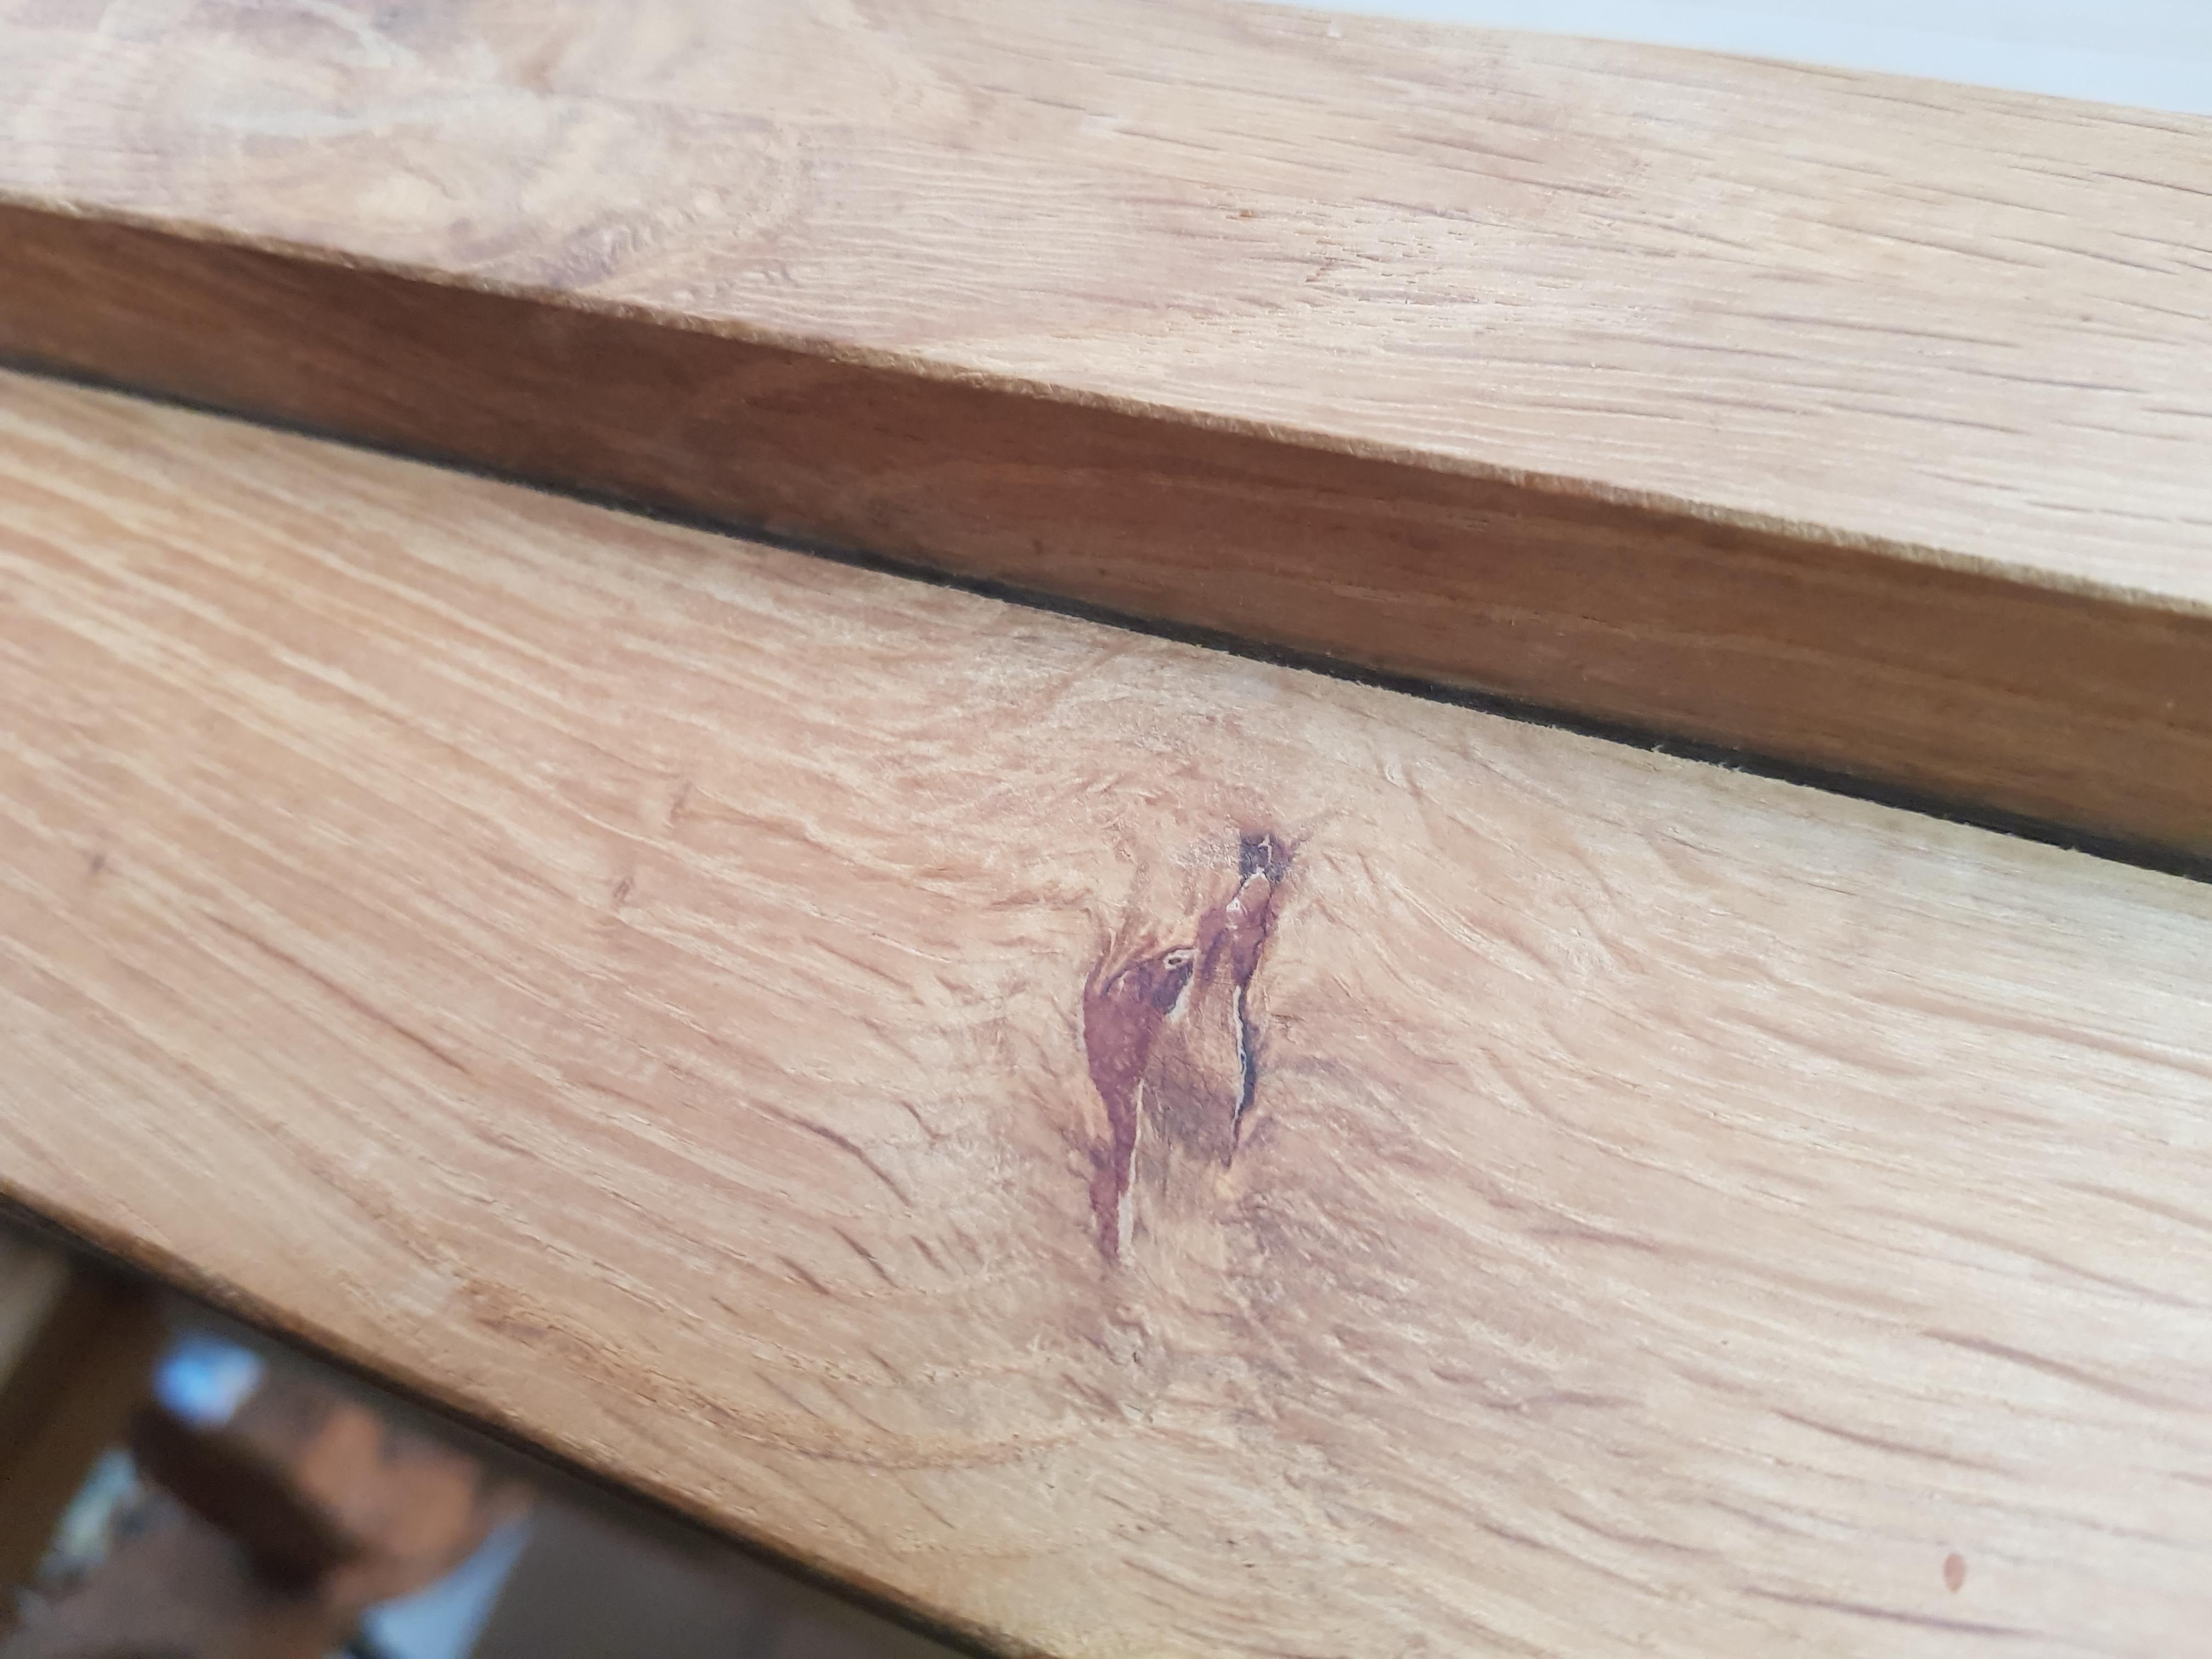 hardwood floor specialists redondo beach of https imgur com gallery nf4ta4t daily https imgur com bivrz53 in dpjhyjp